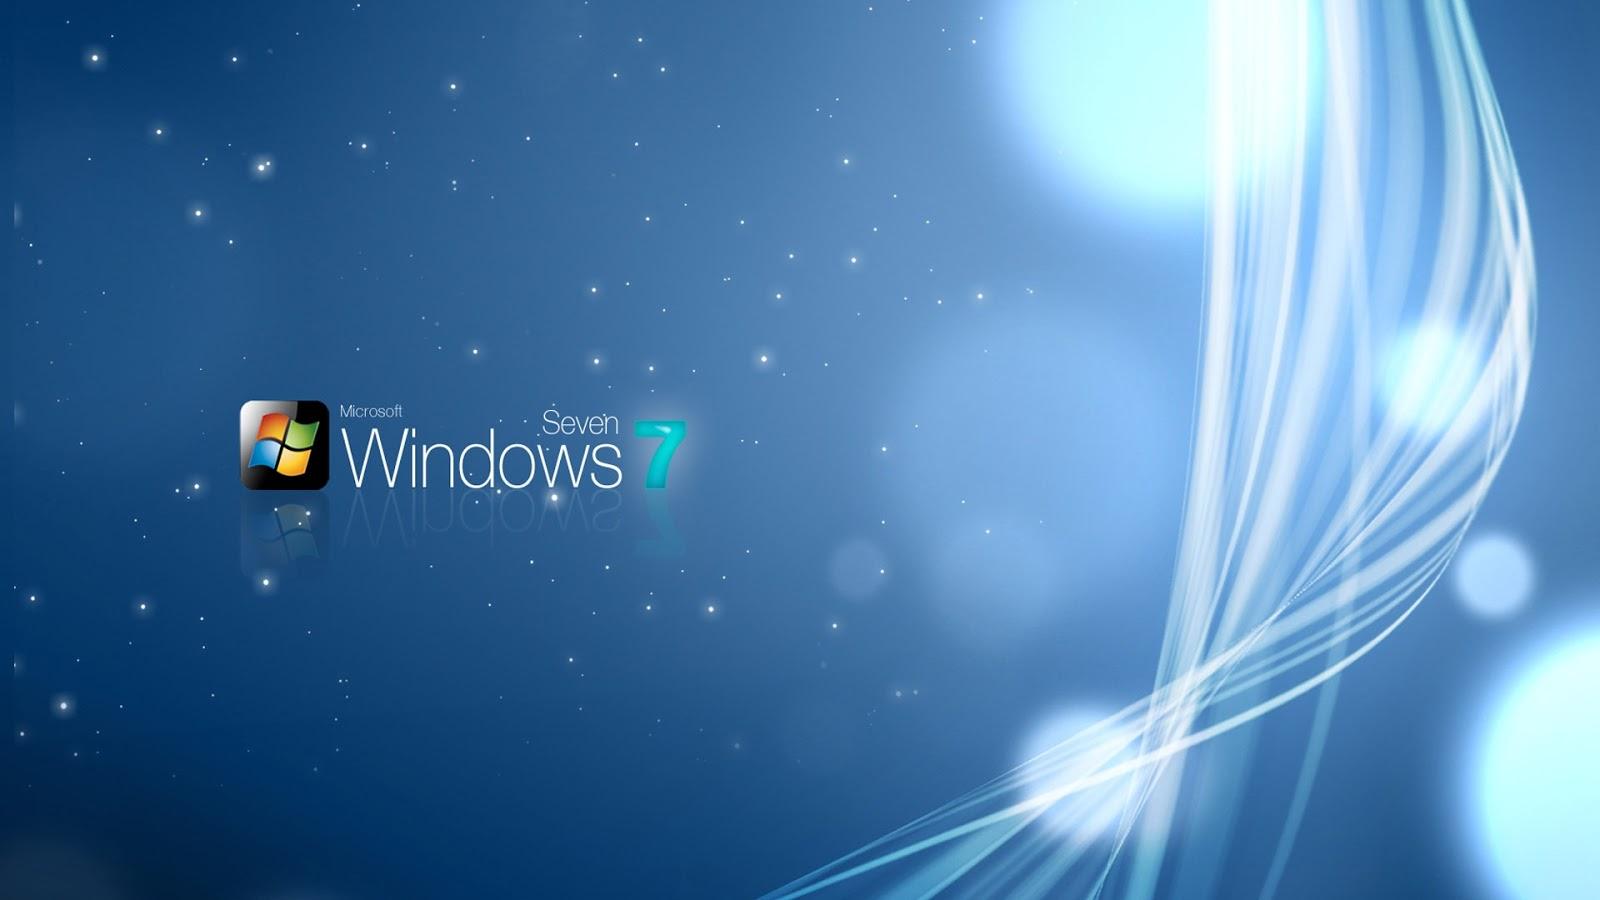 Wallpapers hd 73 wallpapers full hd variados windows 7 - Desktop wallpaper hd free download 1366x768 ...